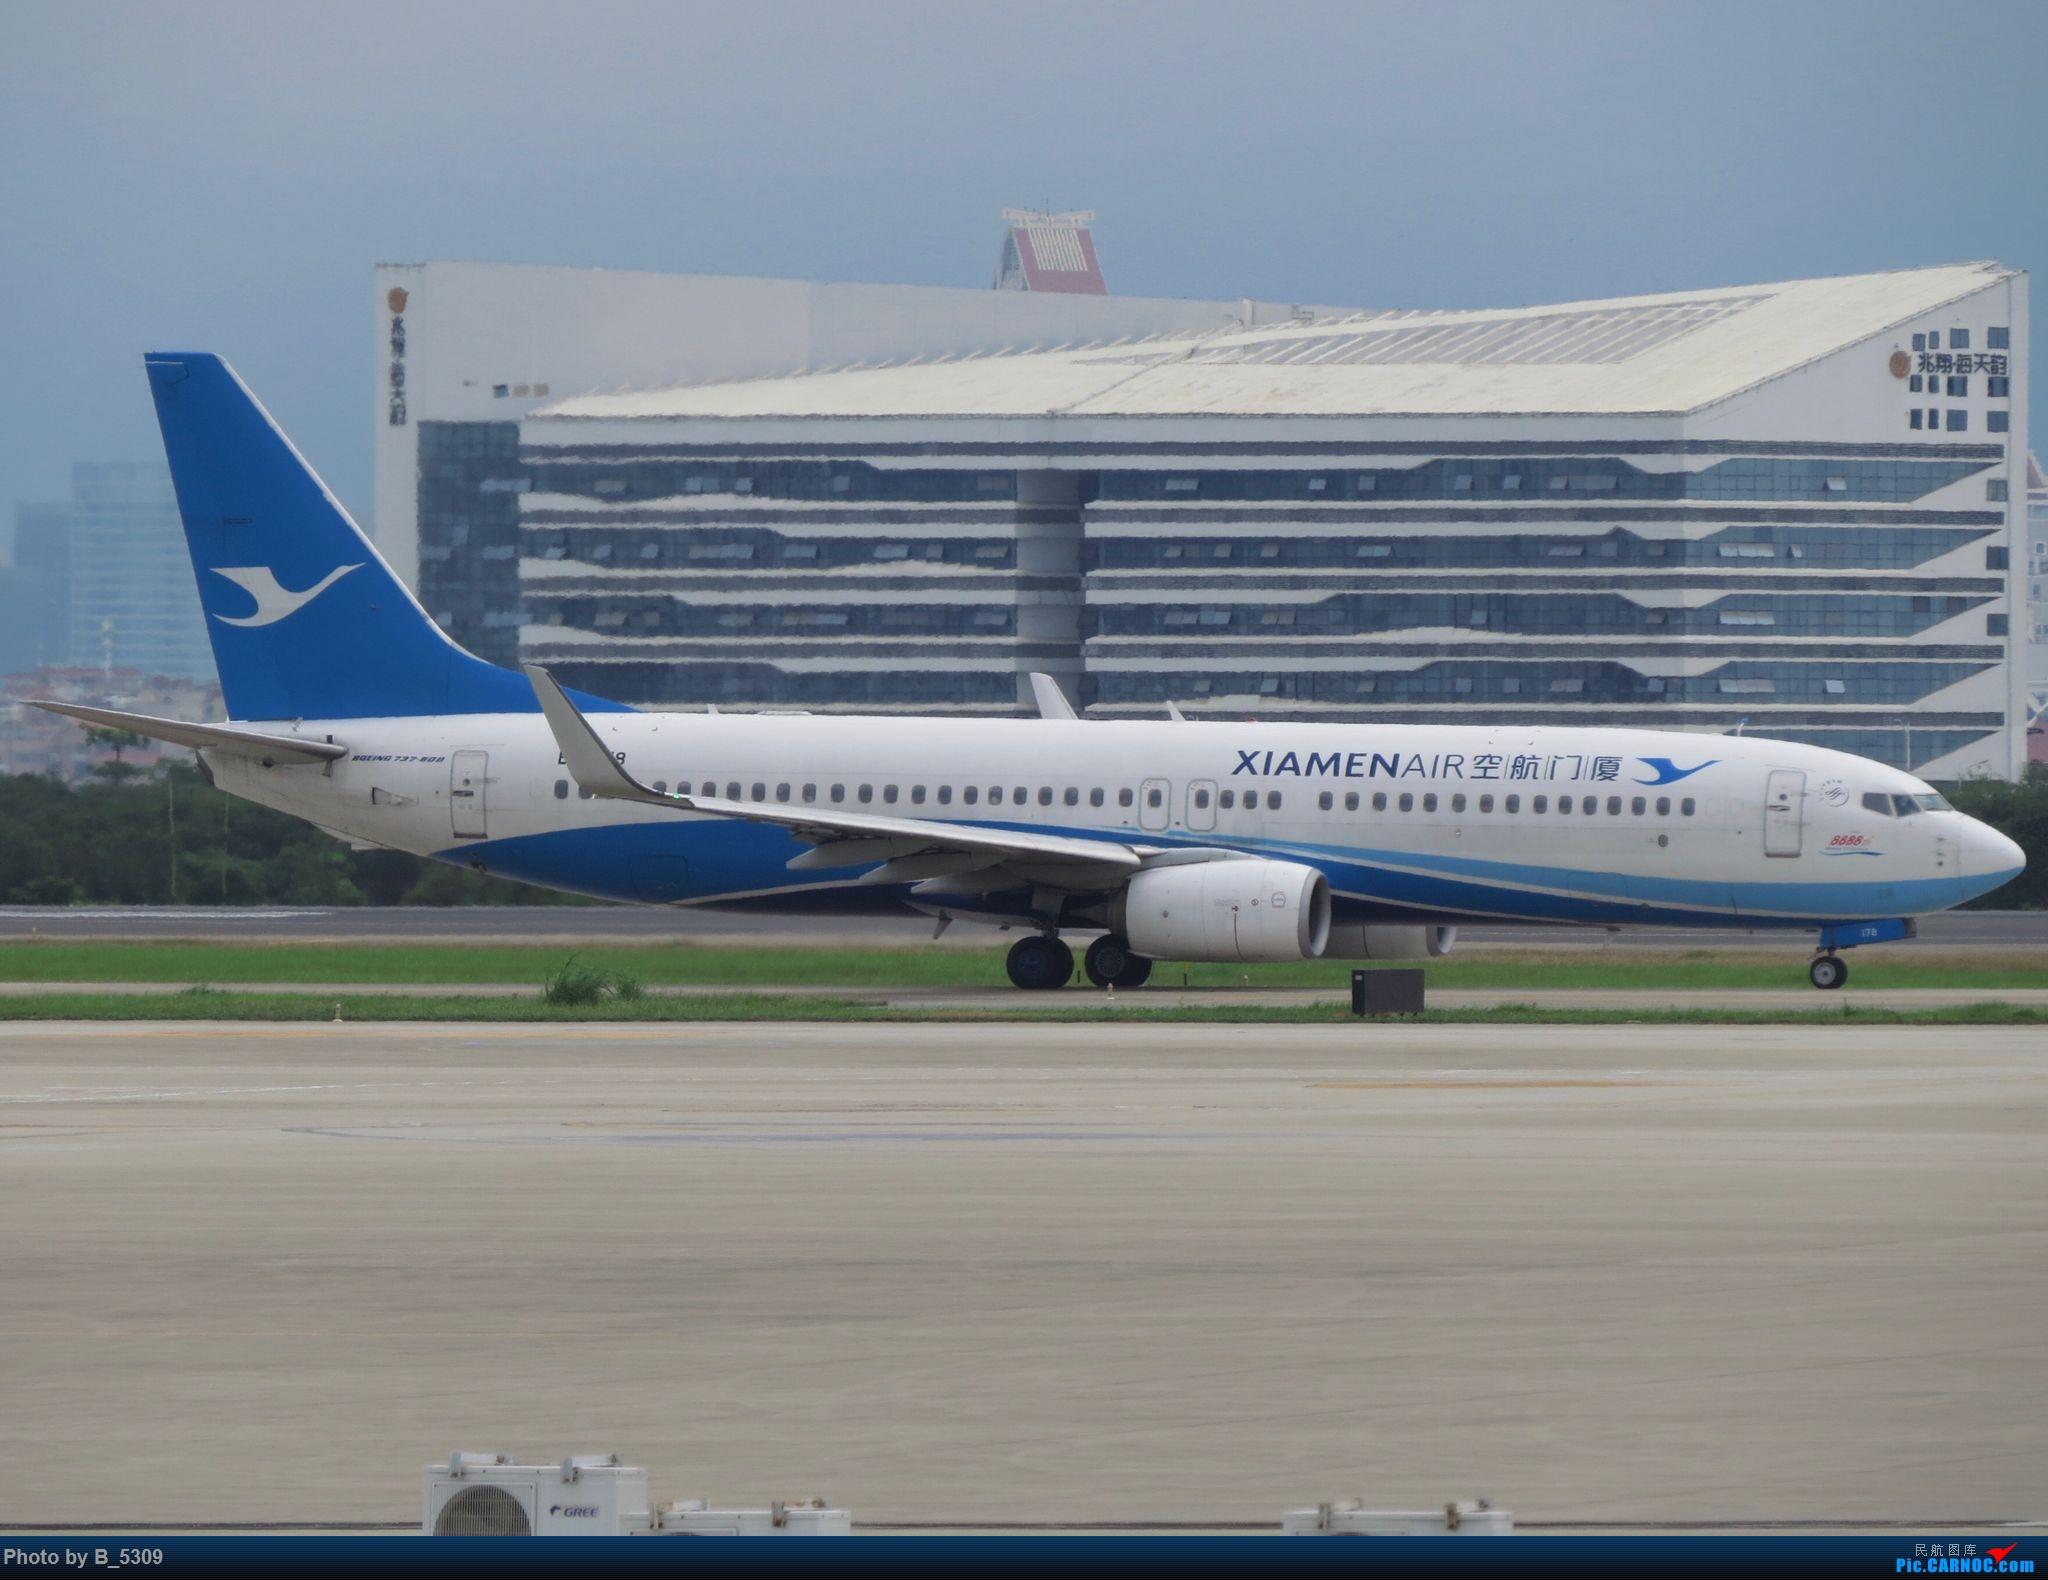 Re:[原创]复课一个月了,终于能在紧张的学习生活中抽出点时间拍稽~ BOEING 737-800 B-7178 中国厦门高崎国际机场